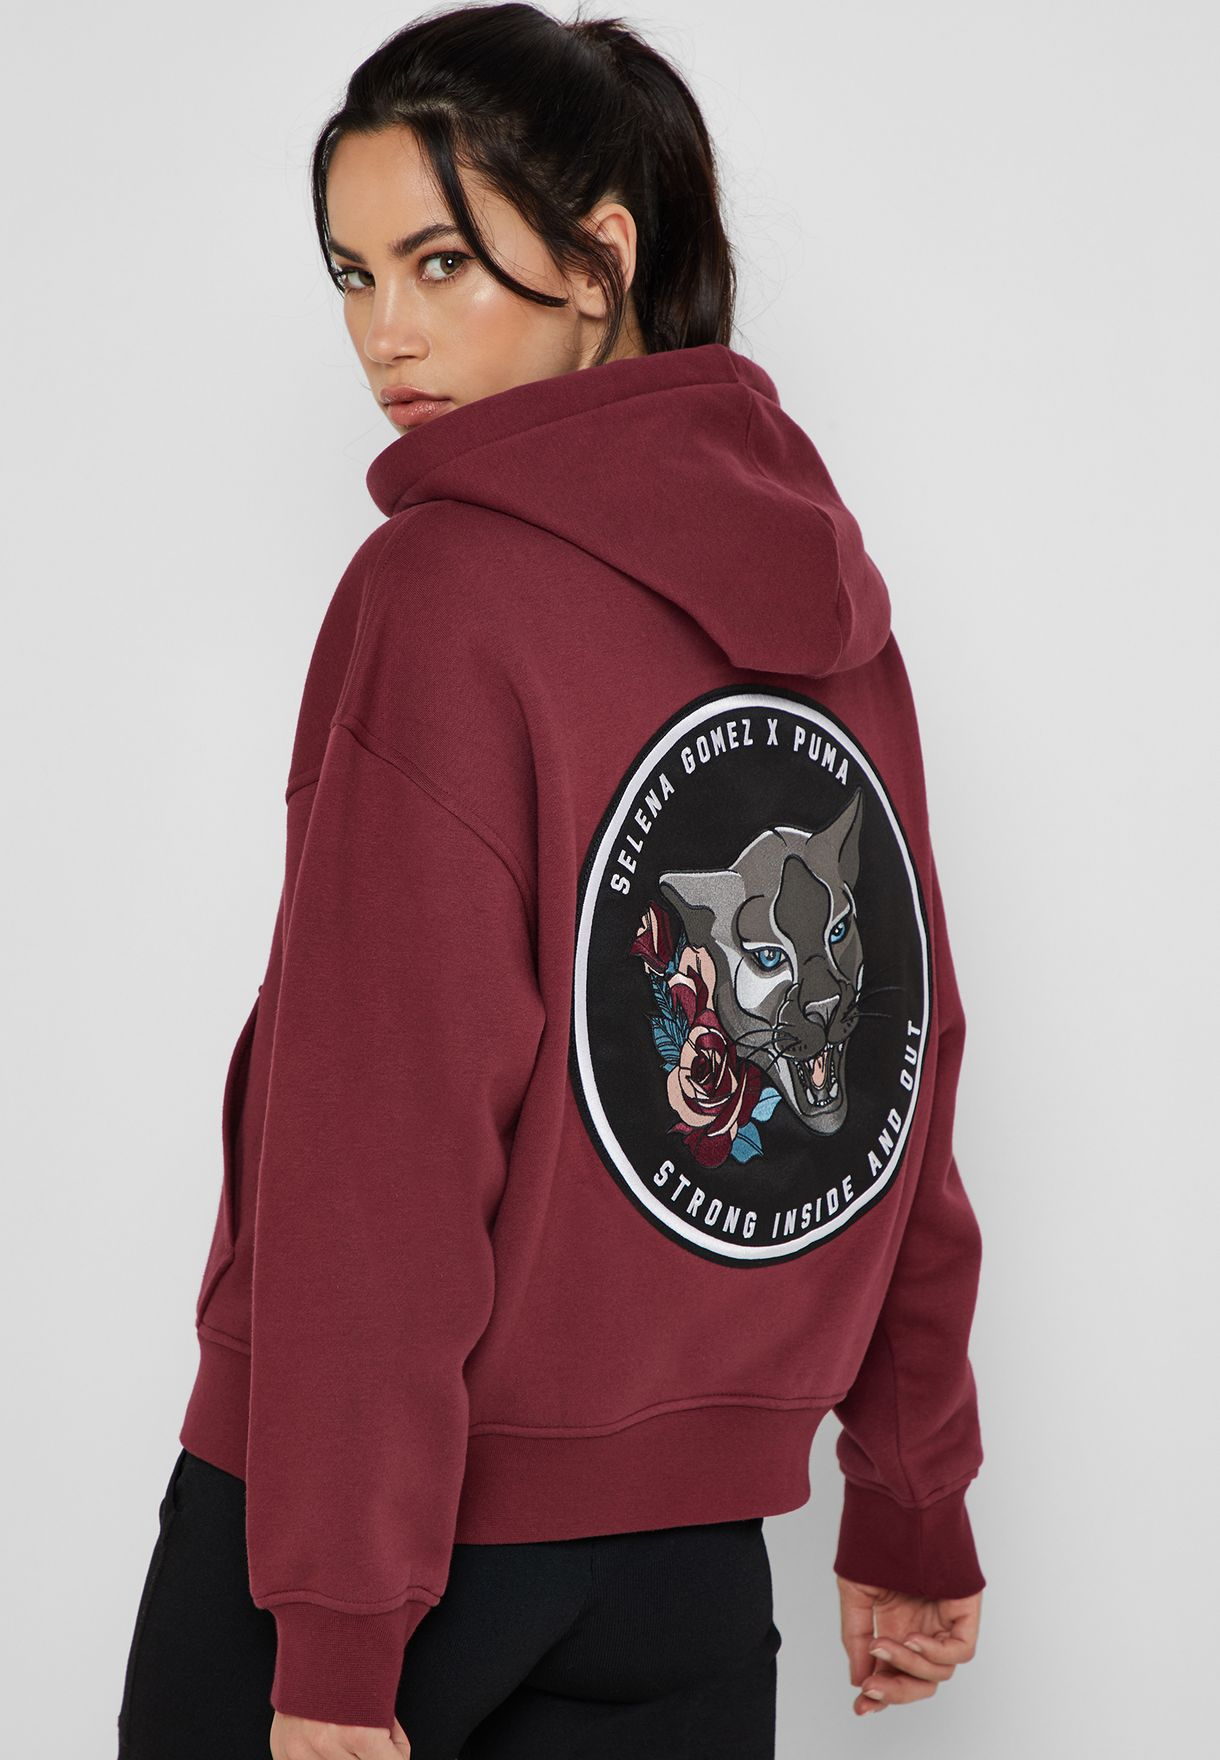 b2646be2a7b9 Shop PUMA red Selena Gomez Hoodie 51780503 for Women in Saudi ...